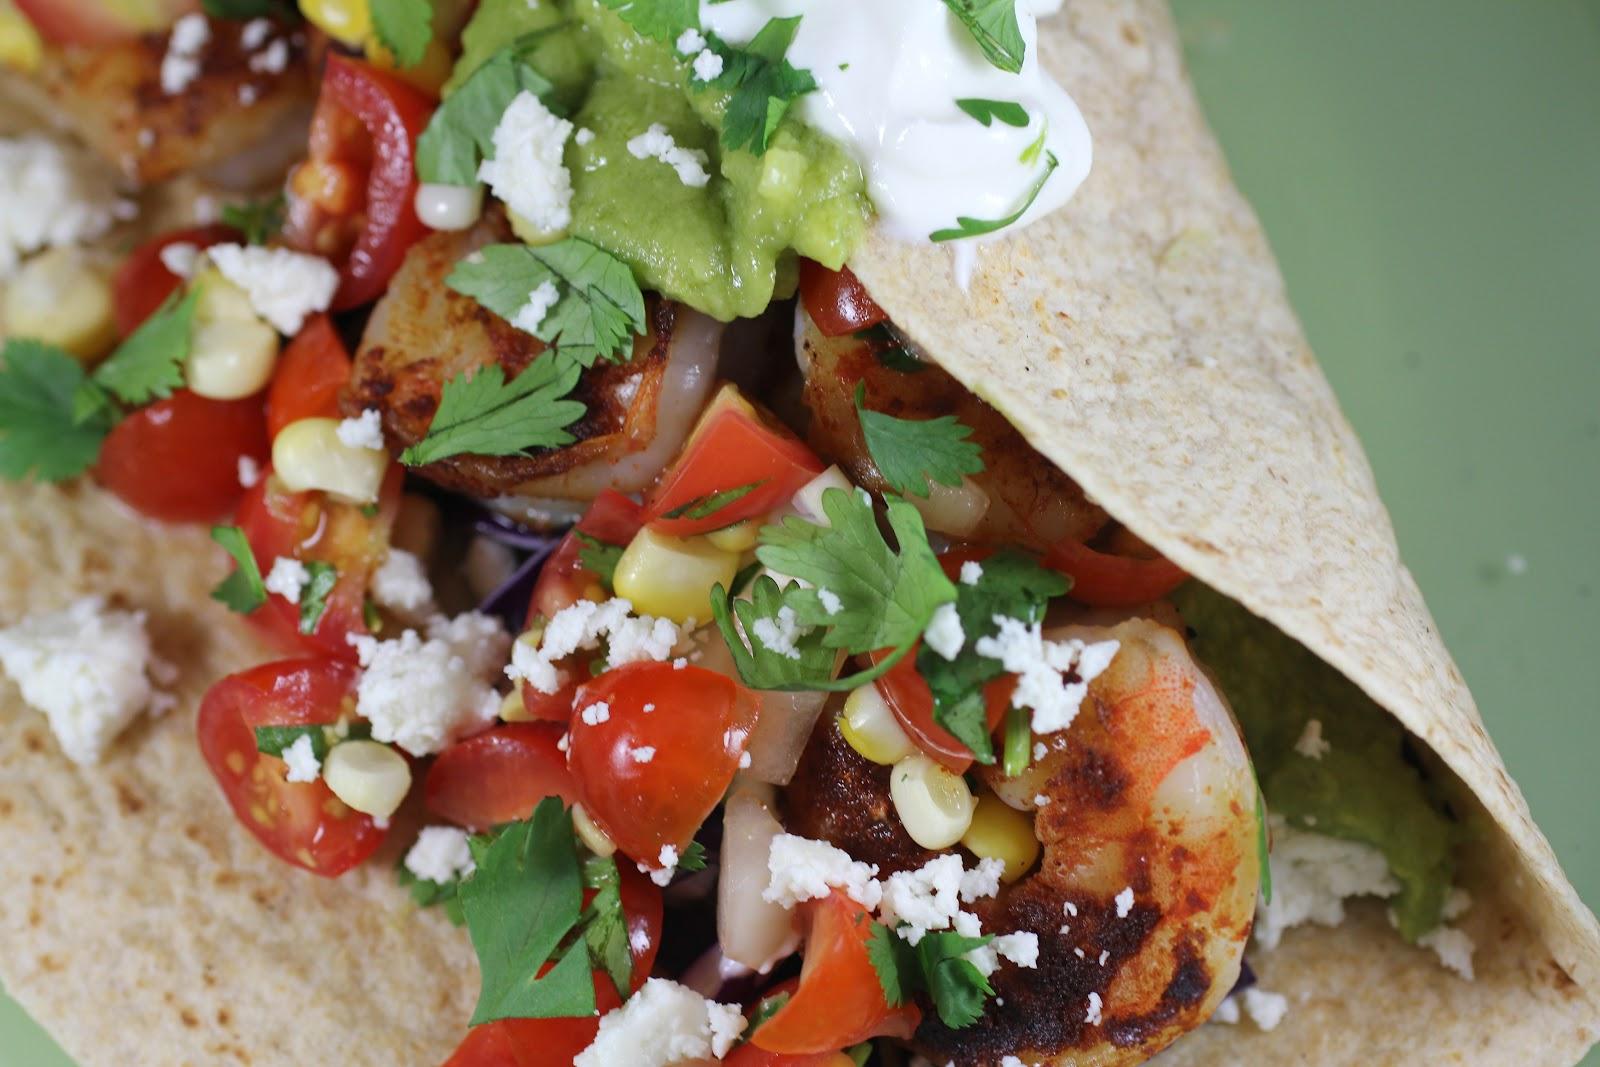 Crostini and Chianti: Shrimp Tacos